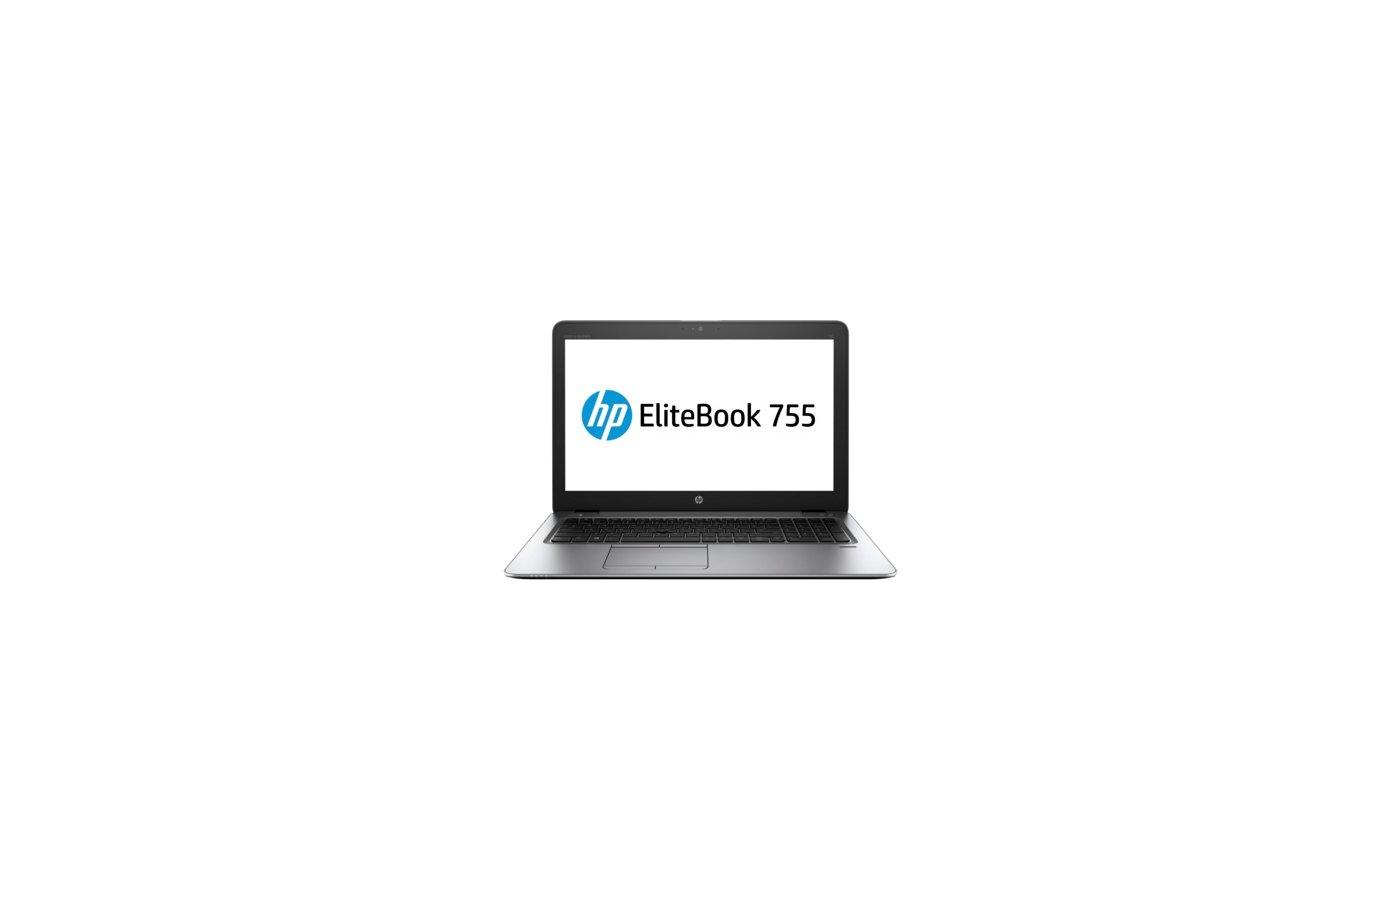 Ноутбук HP EliteBook 755 G3 /P4T46EA/